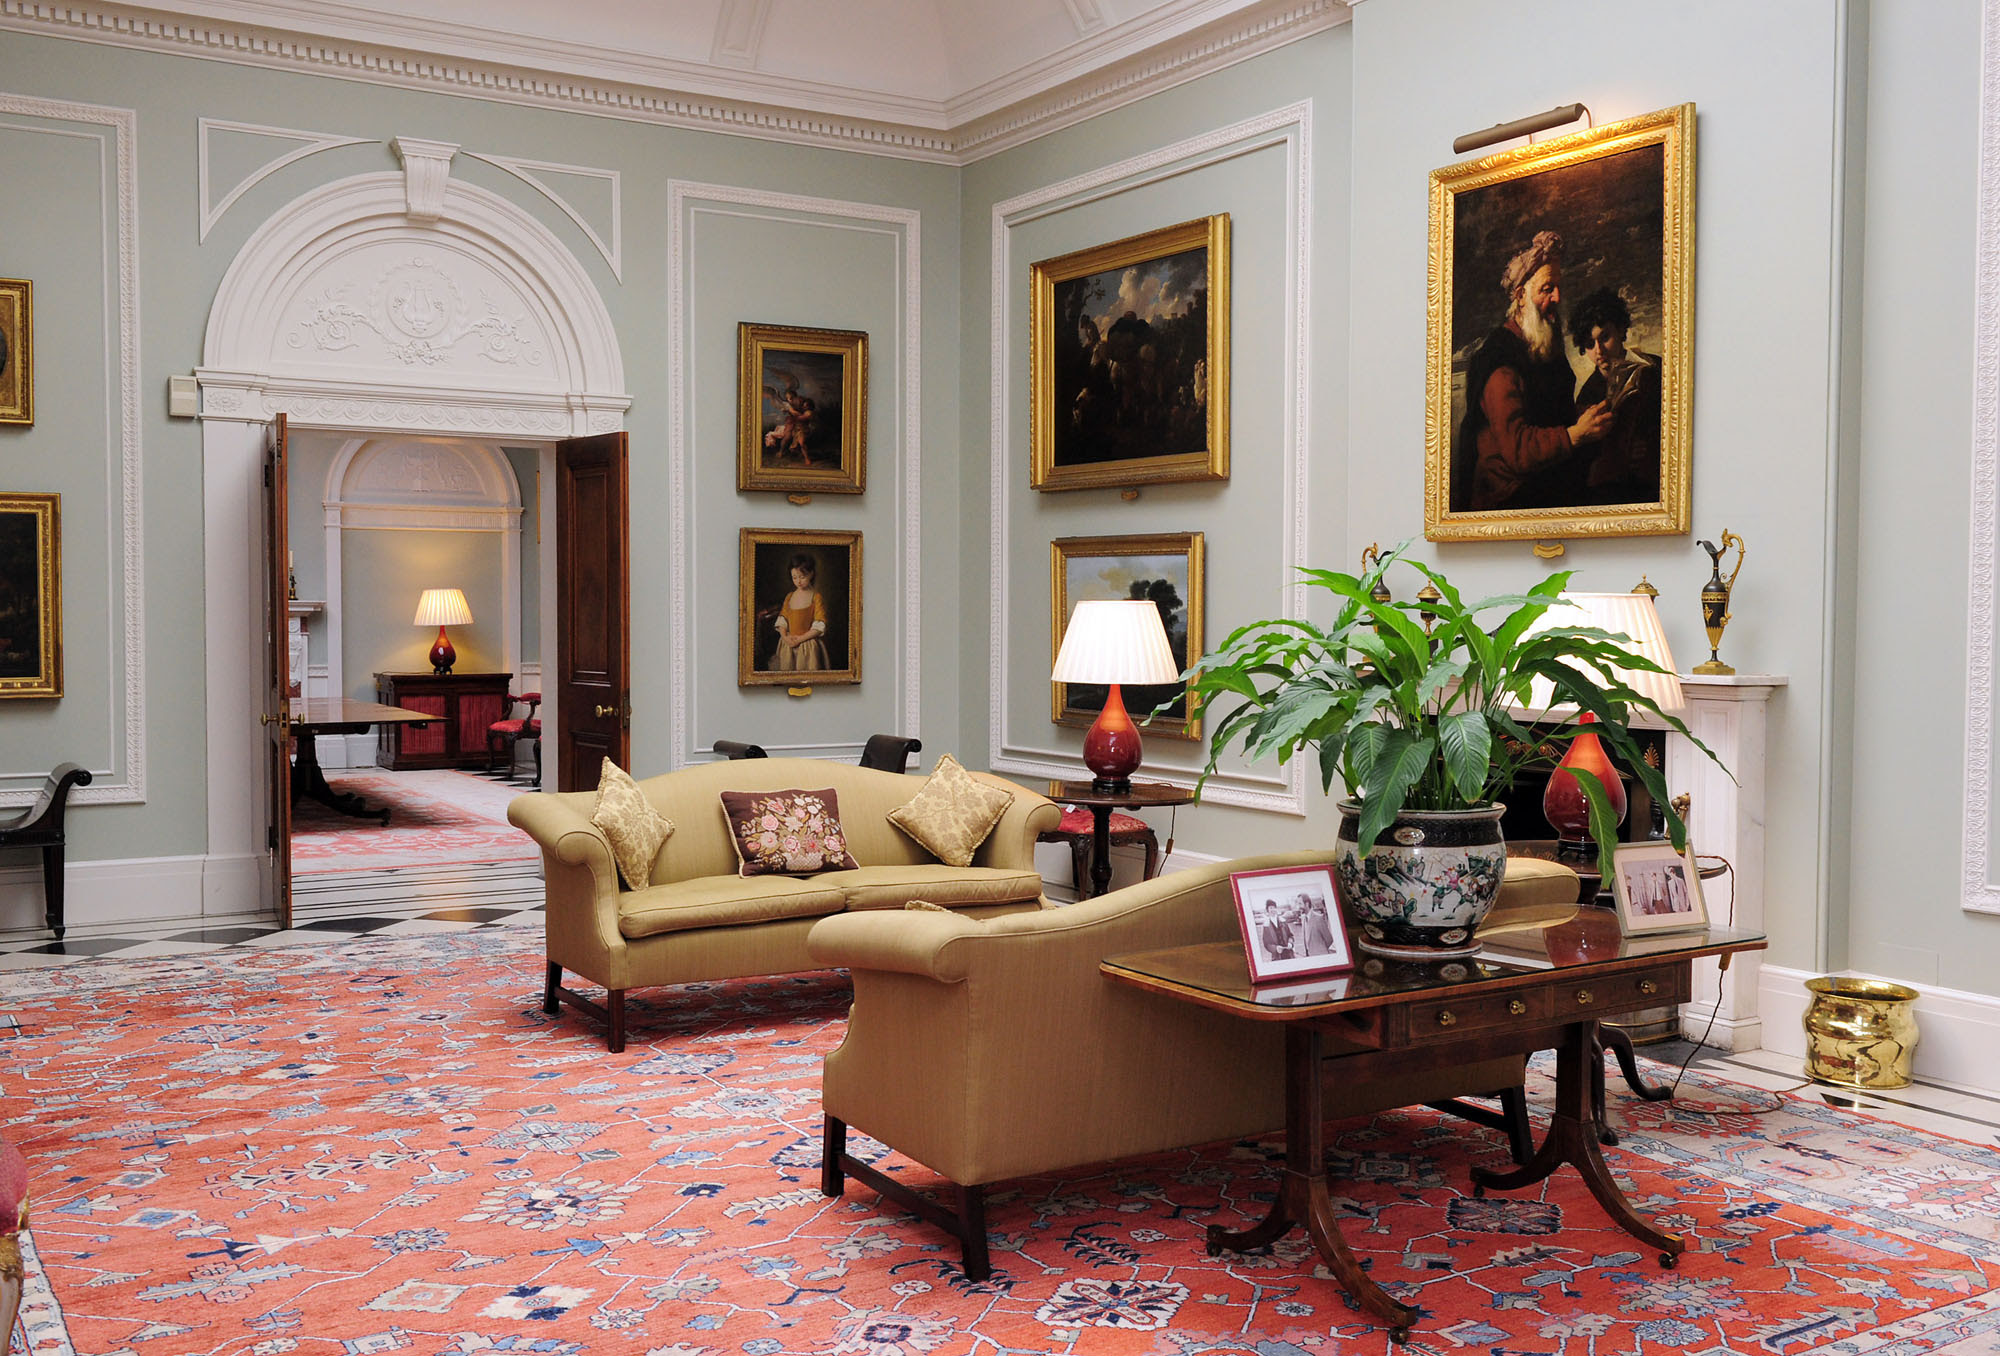 Living Room Seating Arrangements - Living Room | Living ...